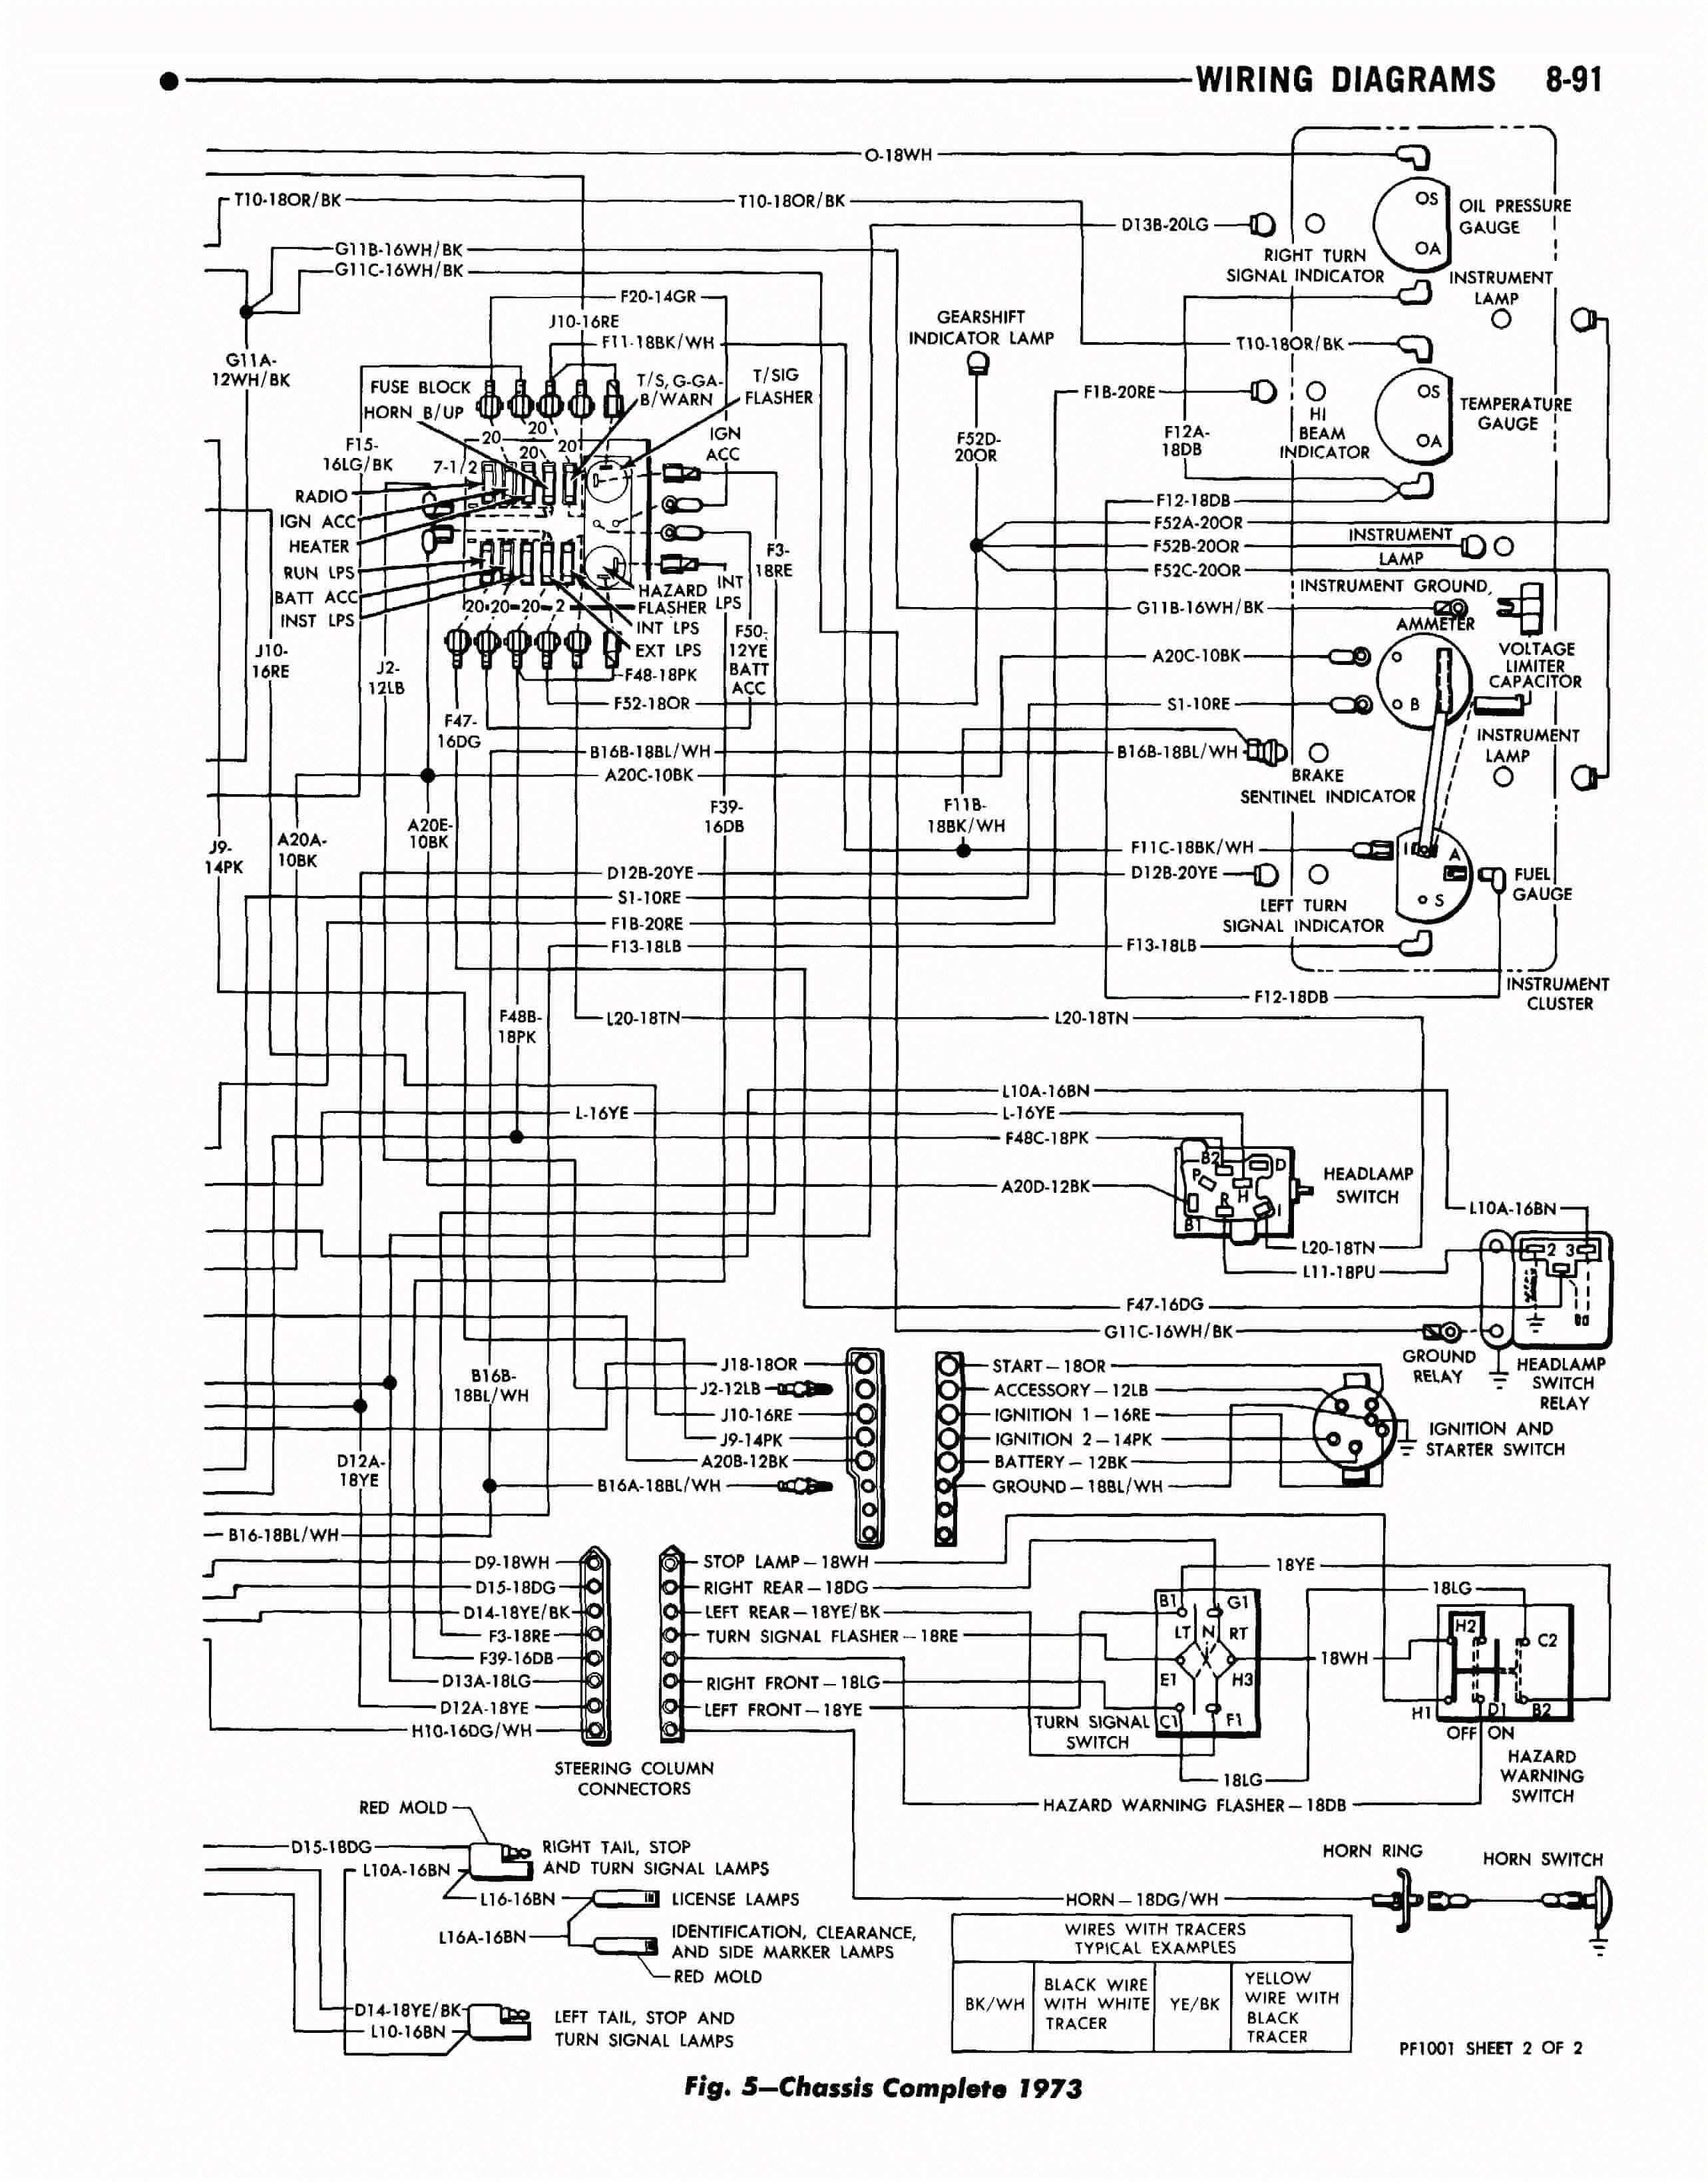 wiring diagram for rv wiring diagram operationstypical rv electrical wiring diagram wiring diagram ame wiring diagram